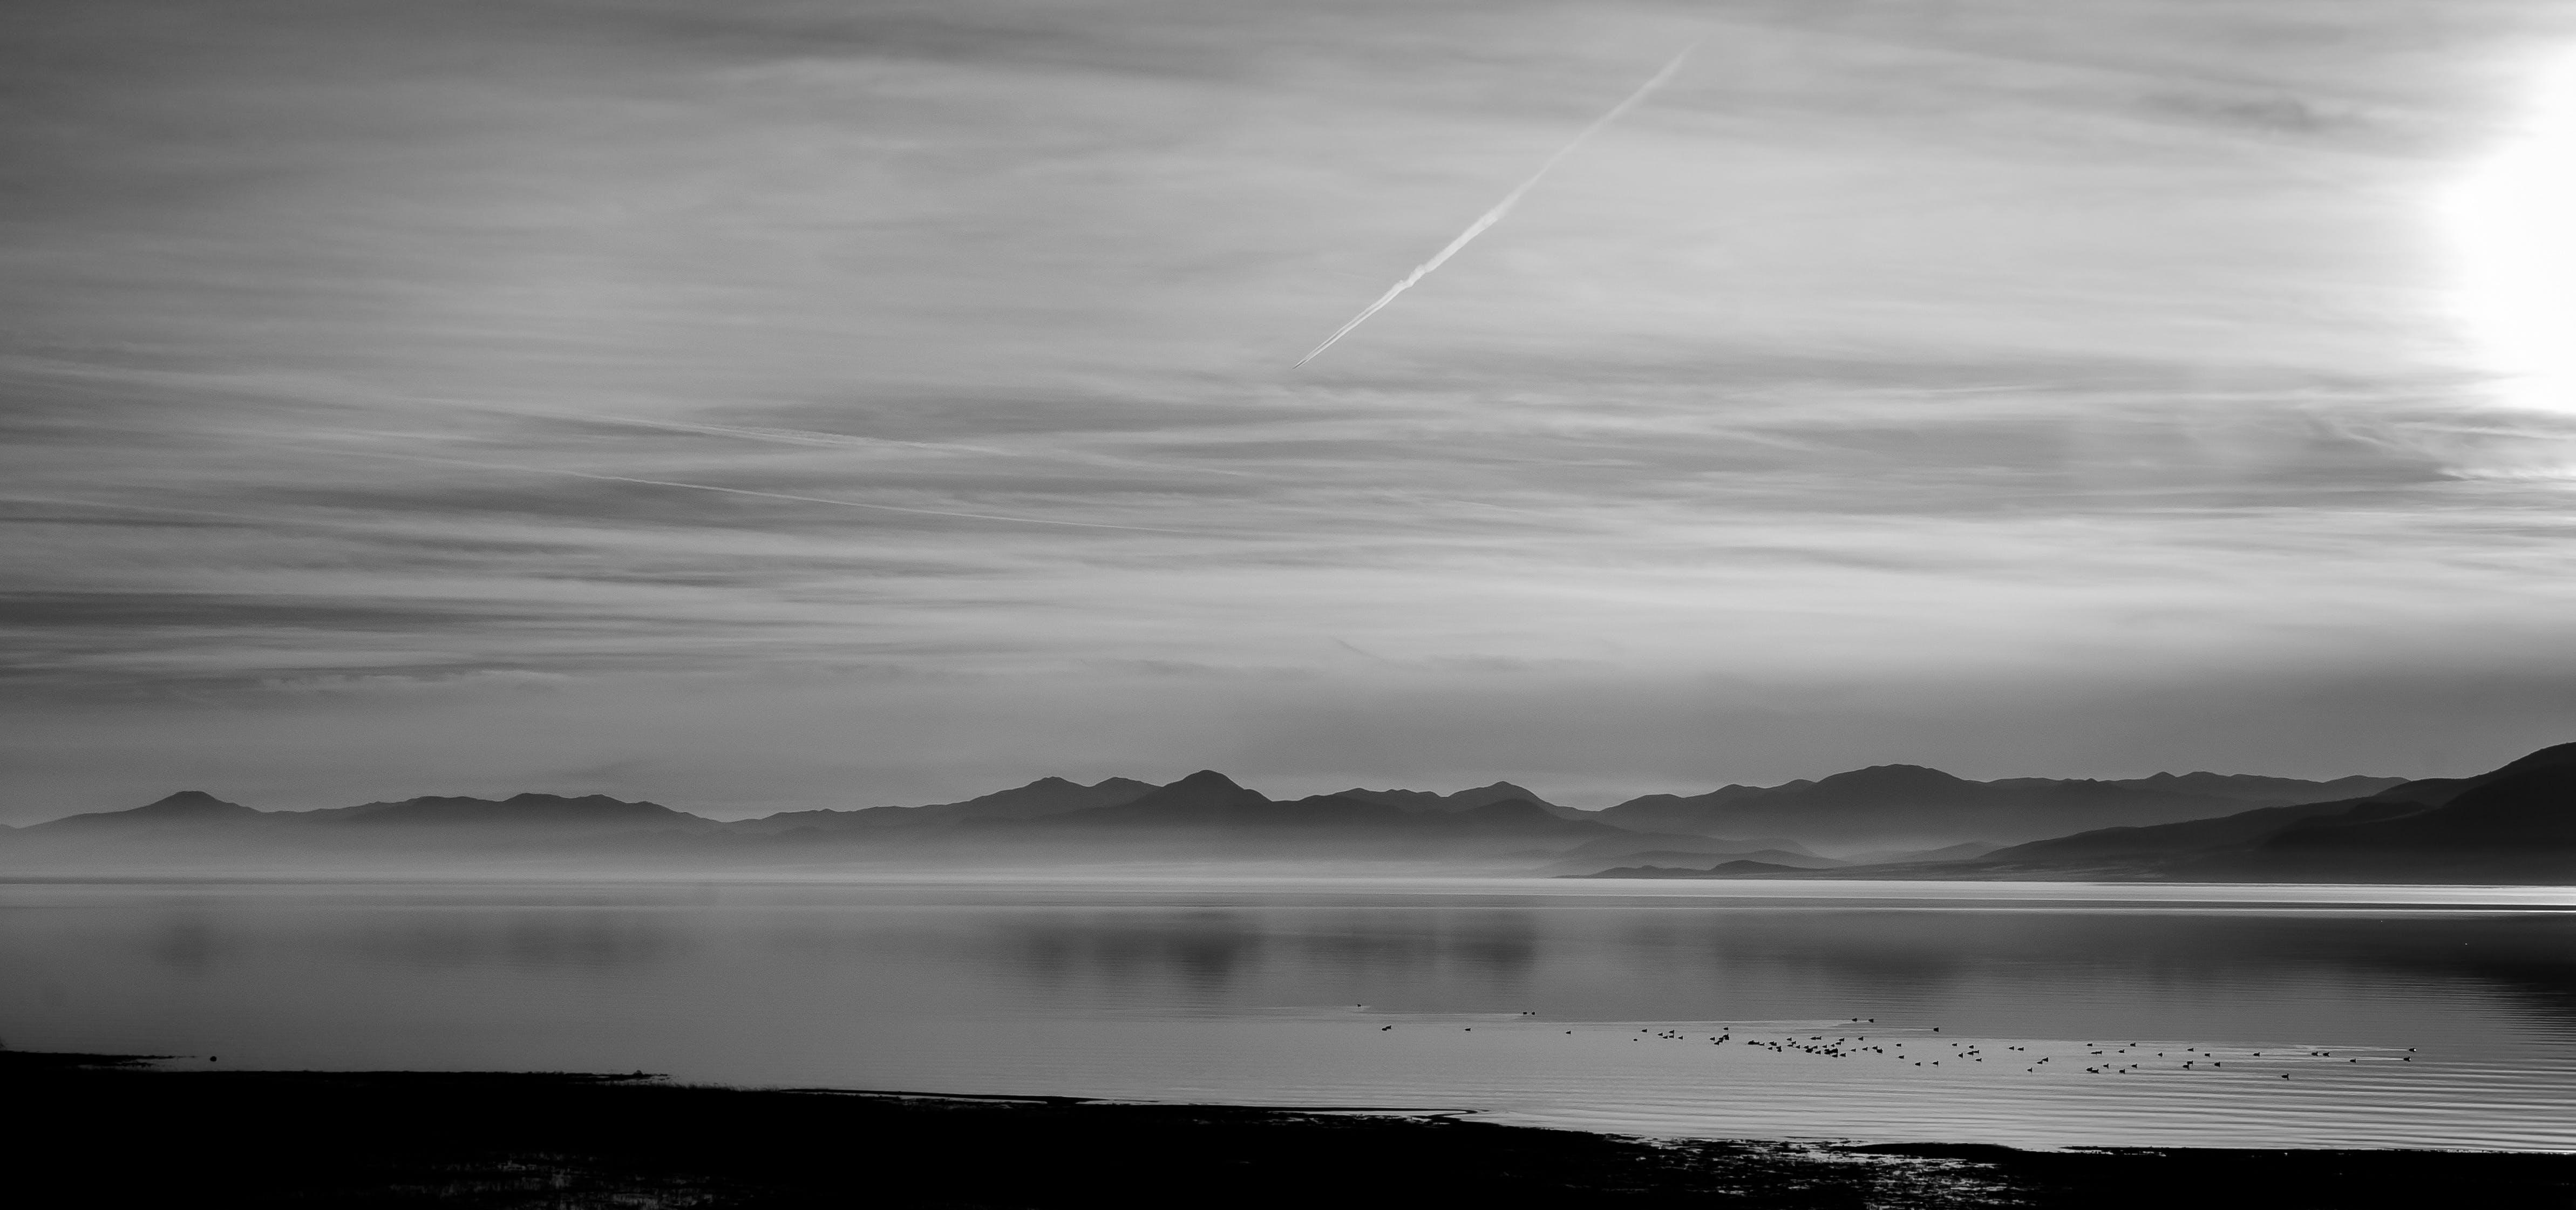 Free stock photo of beach, black-and-white, dawn, dusk